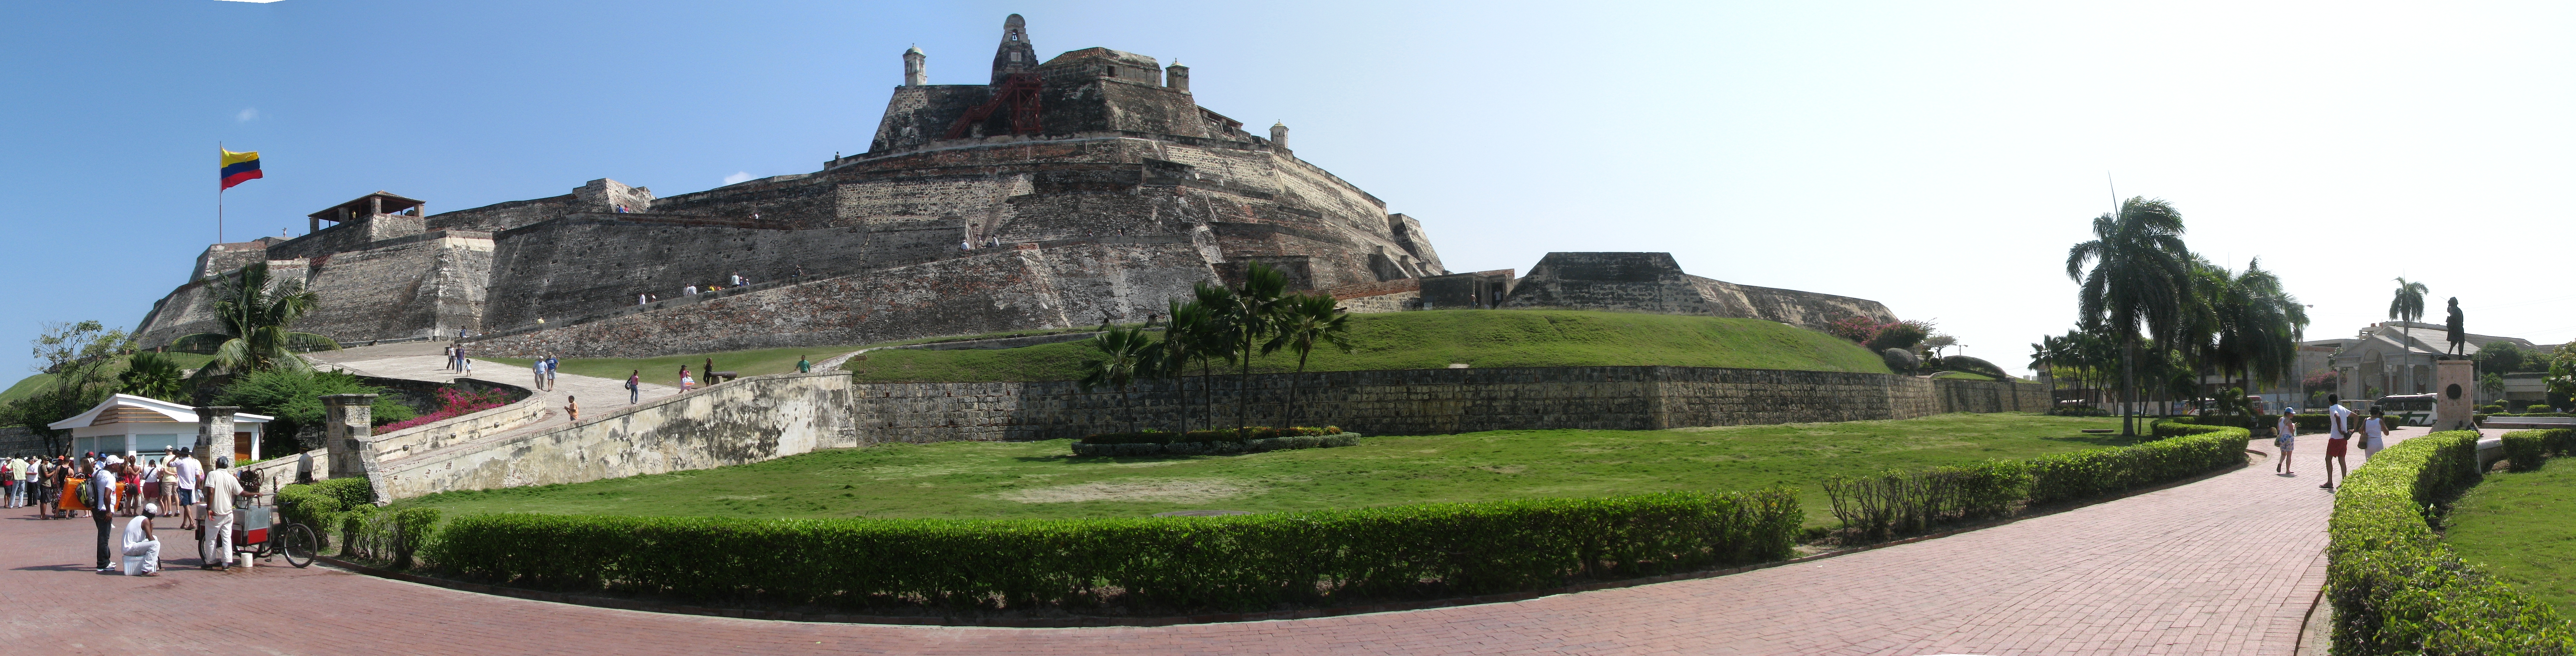 archivo castillo de san felipe de barajas 2 jpg wikipedia la rh es wikipedia org